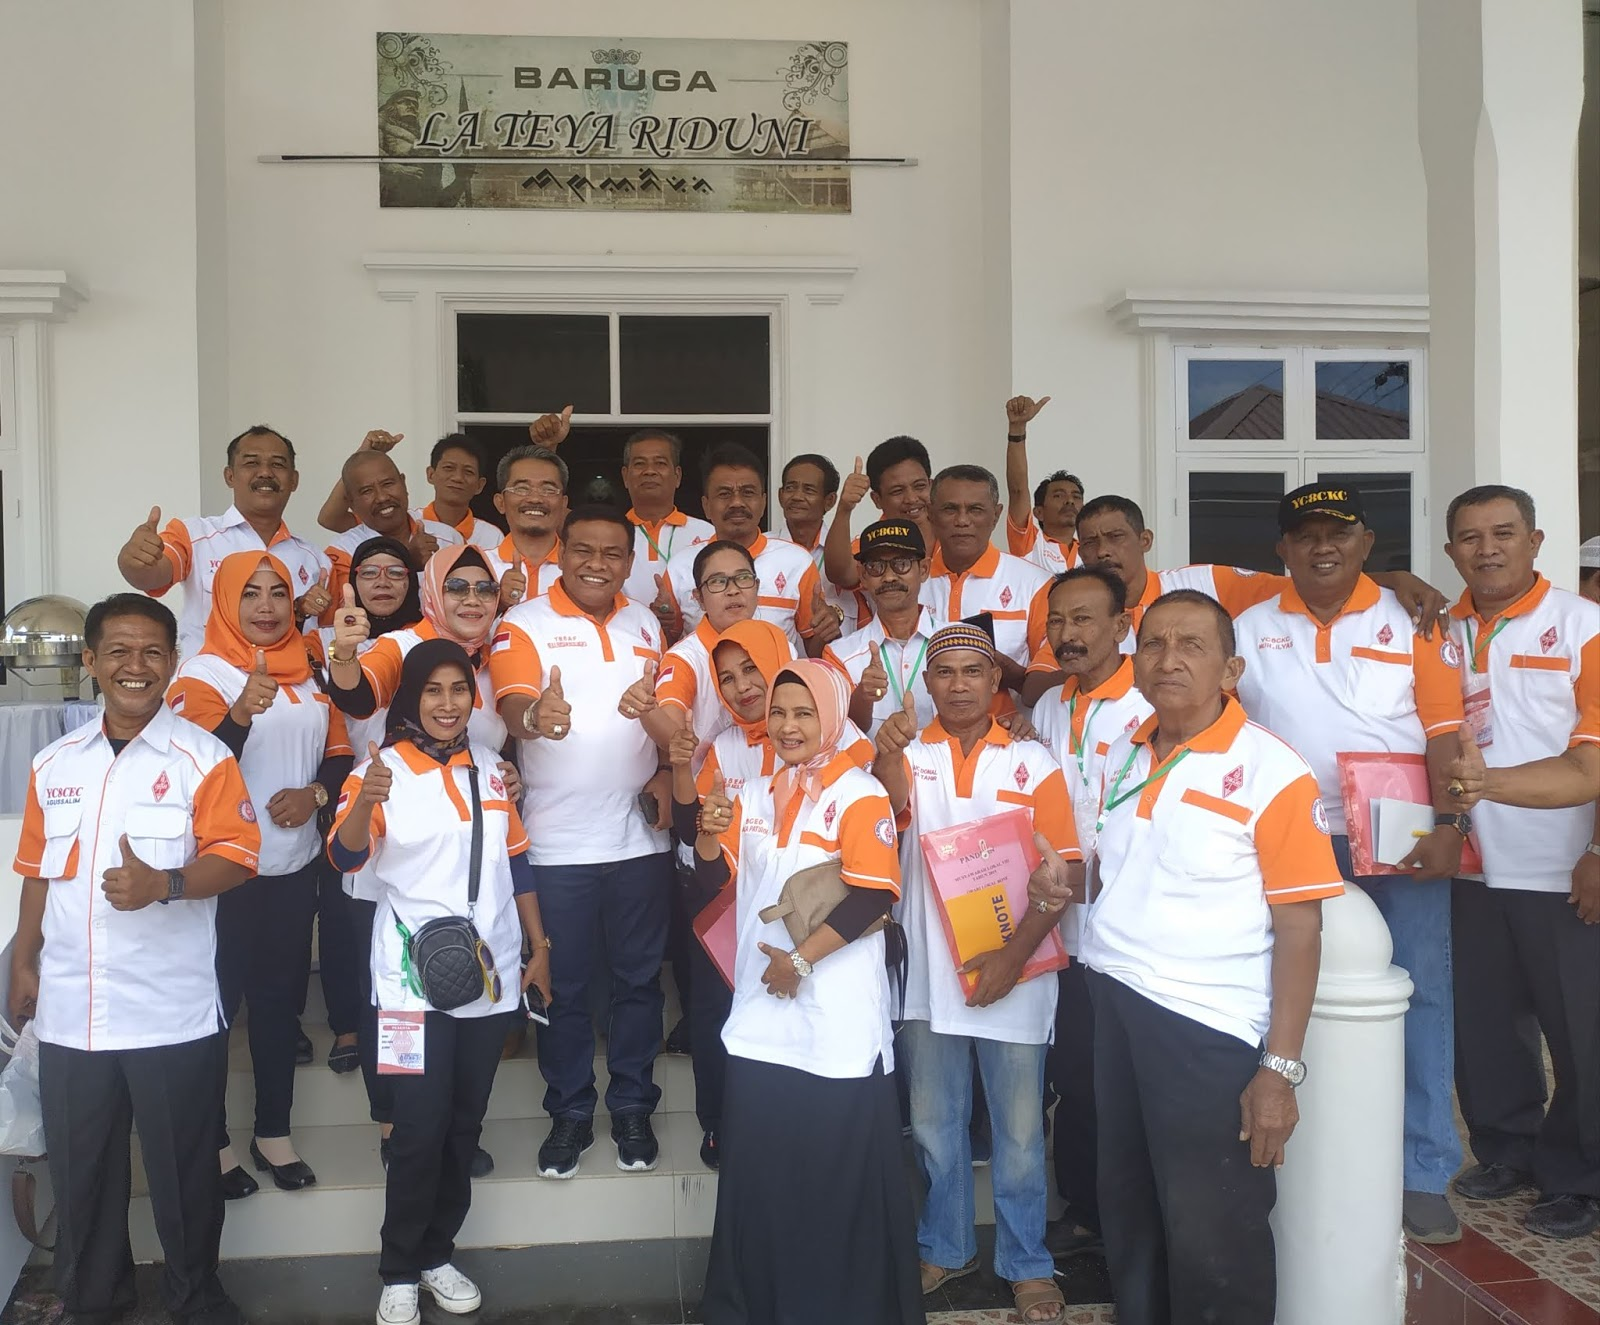 ORARI Lokal Bone Gelar Muslok ke VIII, Bupati Bone Terpilih Ketua Secara Aklamasi